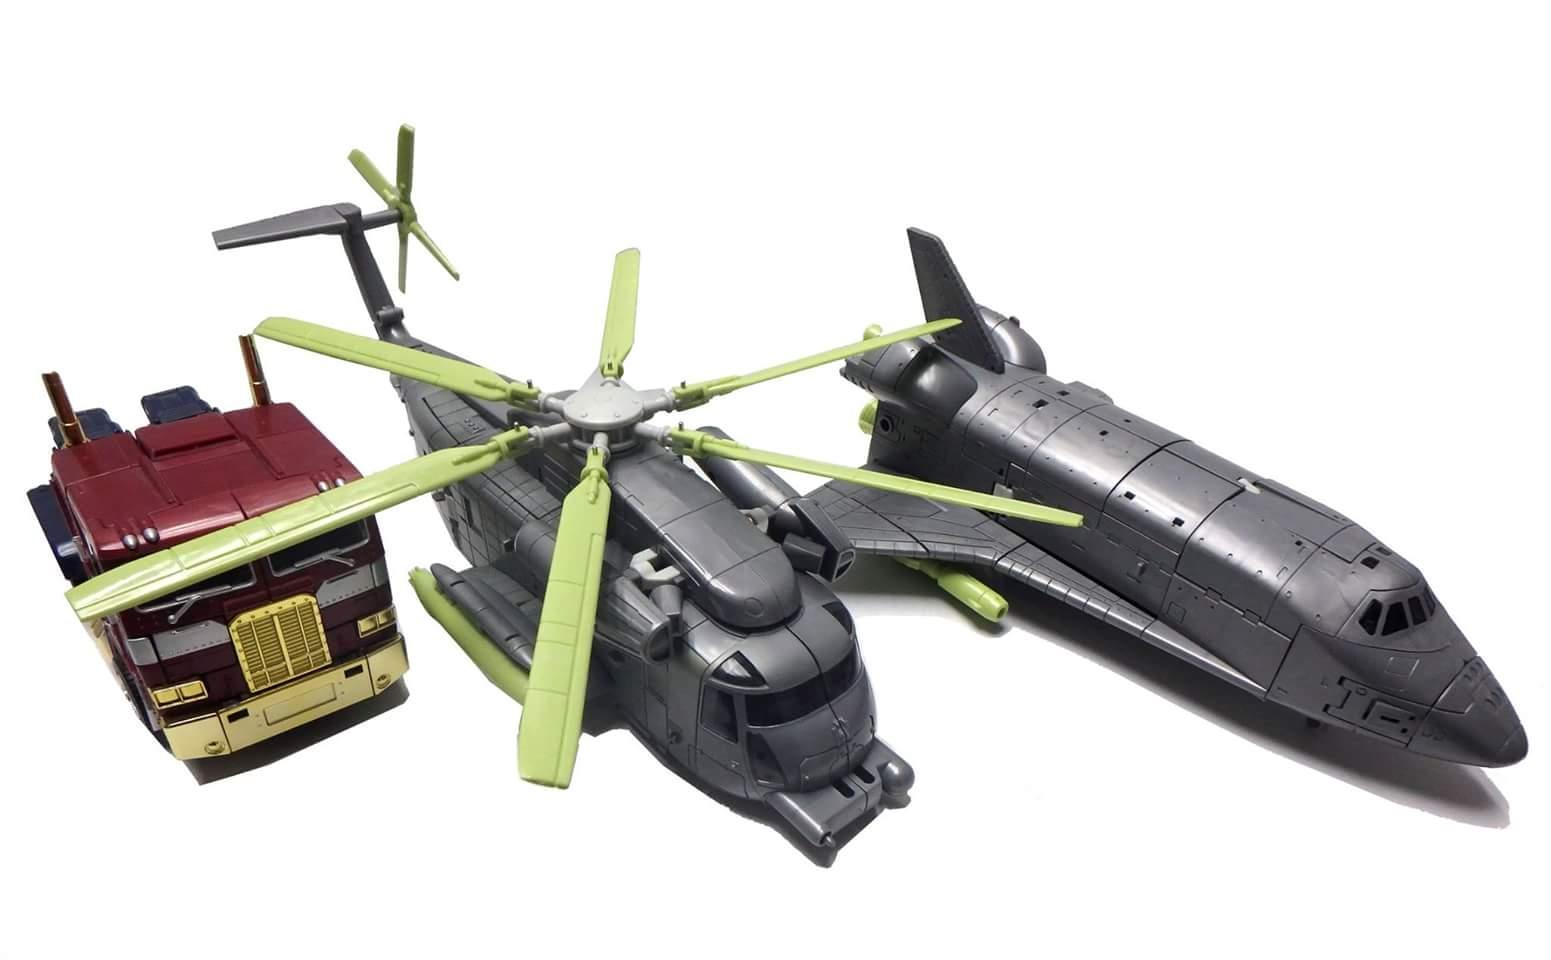 [Zeta Toys] Produit Tiers - Armageddon (ZA-01 à ZA-05) - ZA-06 Bruticon - ZA-07 Bruticon ― aka Bruticus (Studio OX, couleurs G1, métallique) MMPy8nYV